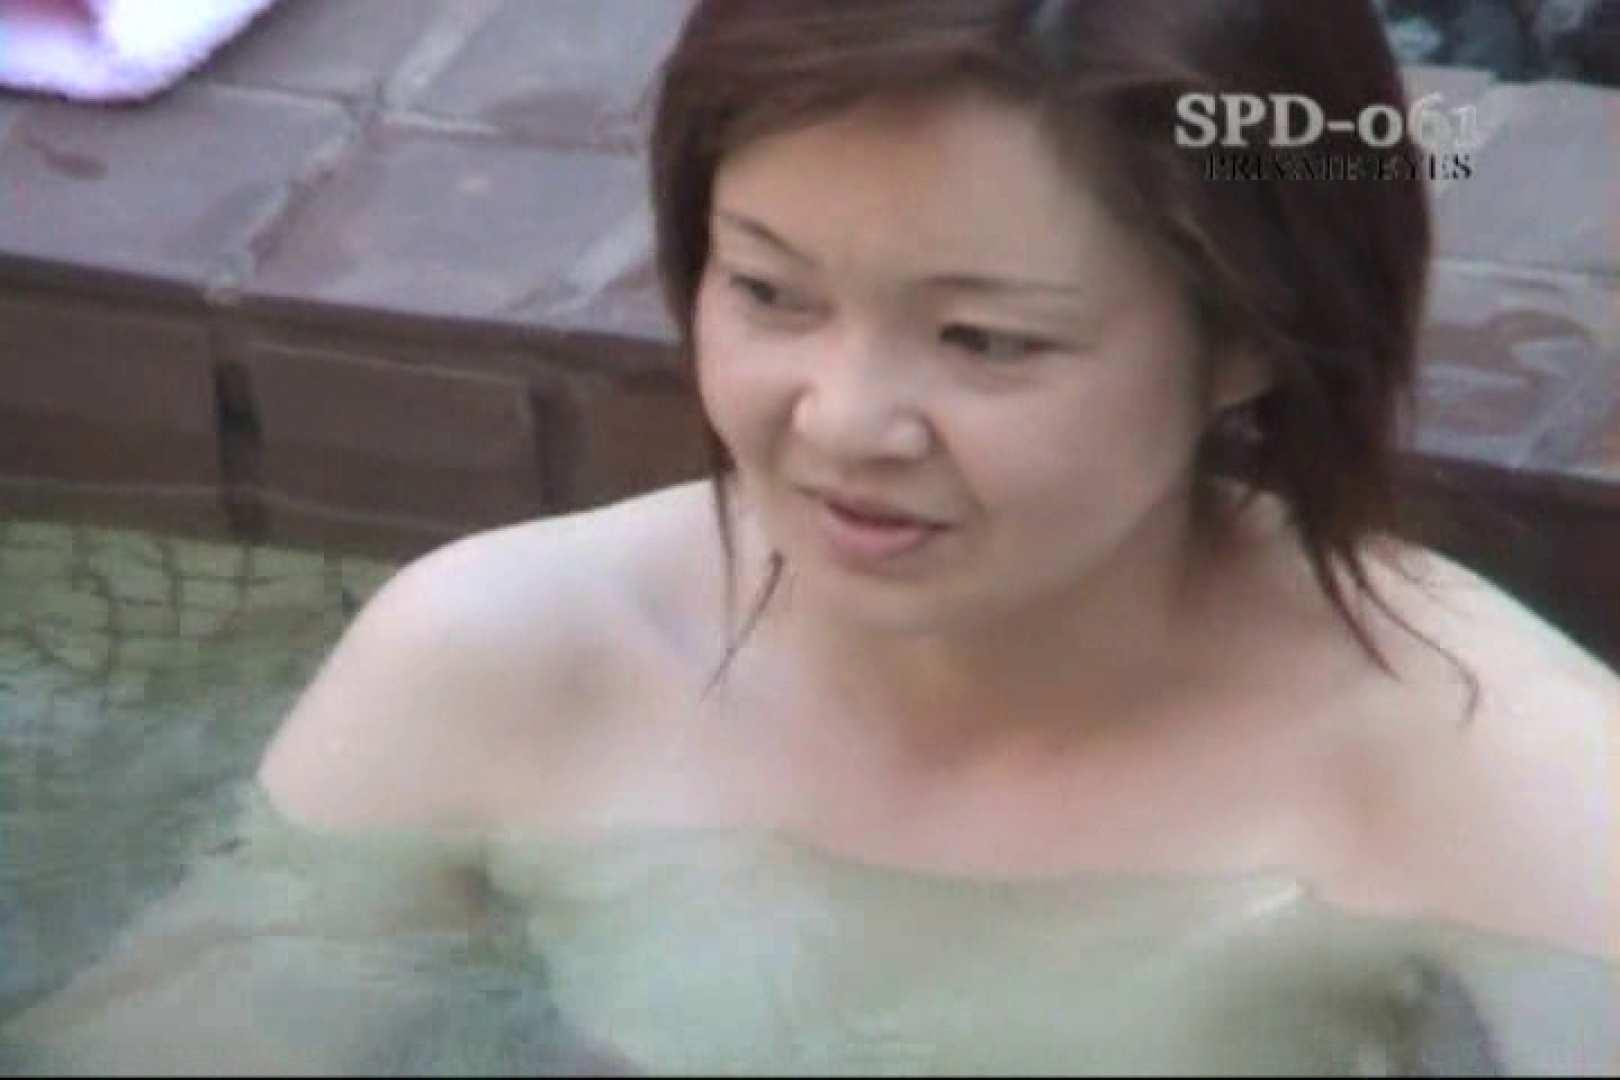 高画質版!SPD-061 新・露天浴場 8 人妻編 露天風呂突入 おめこ無修正動画無料 95pic 17